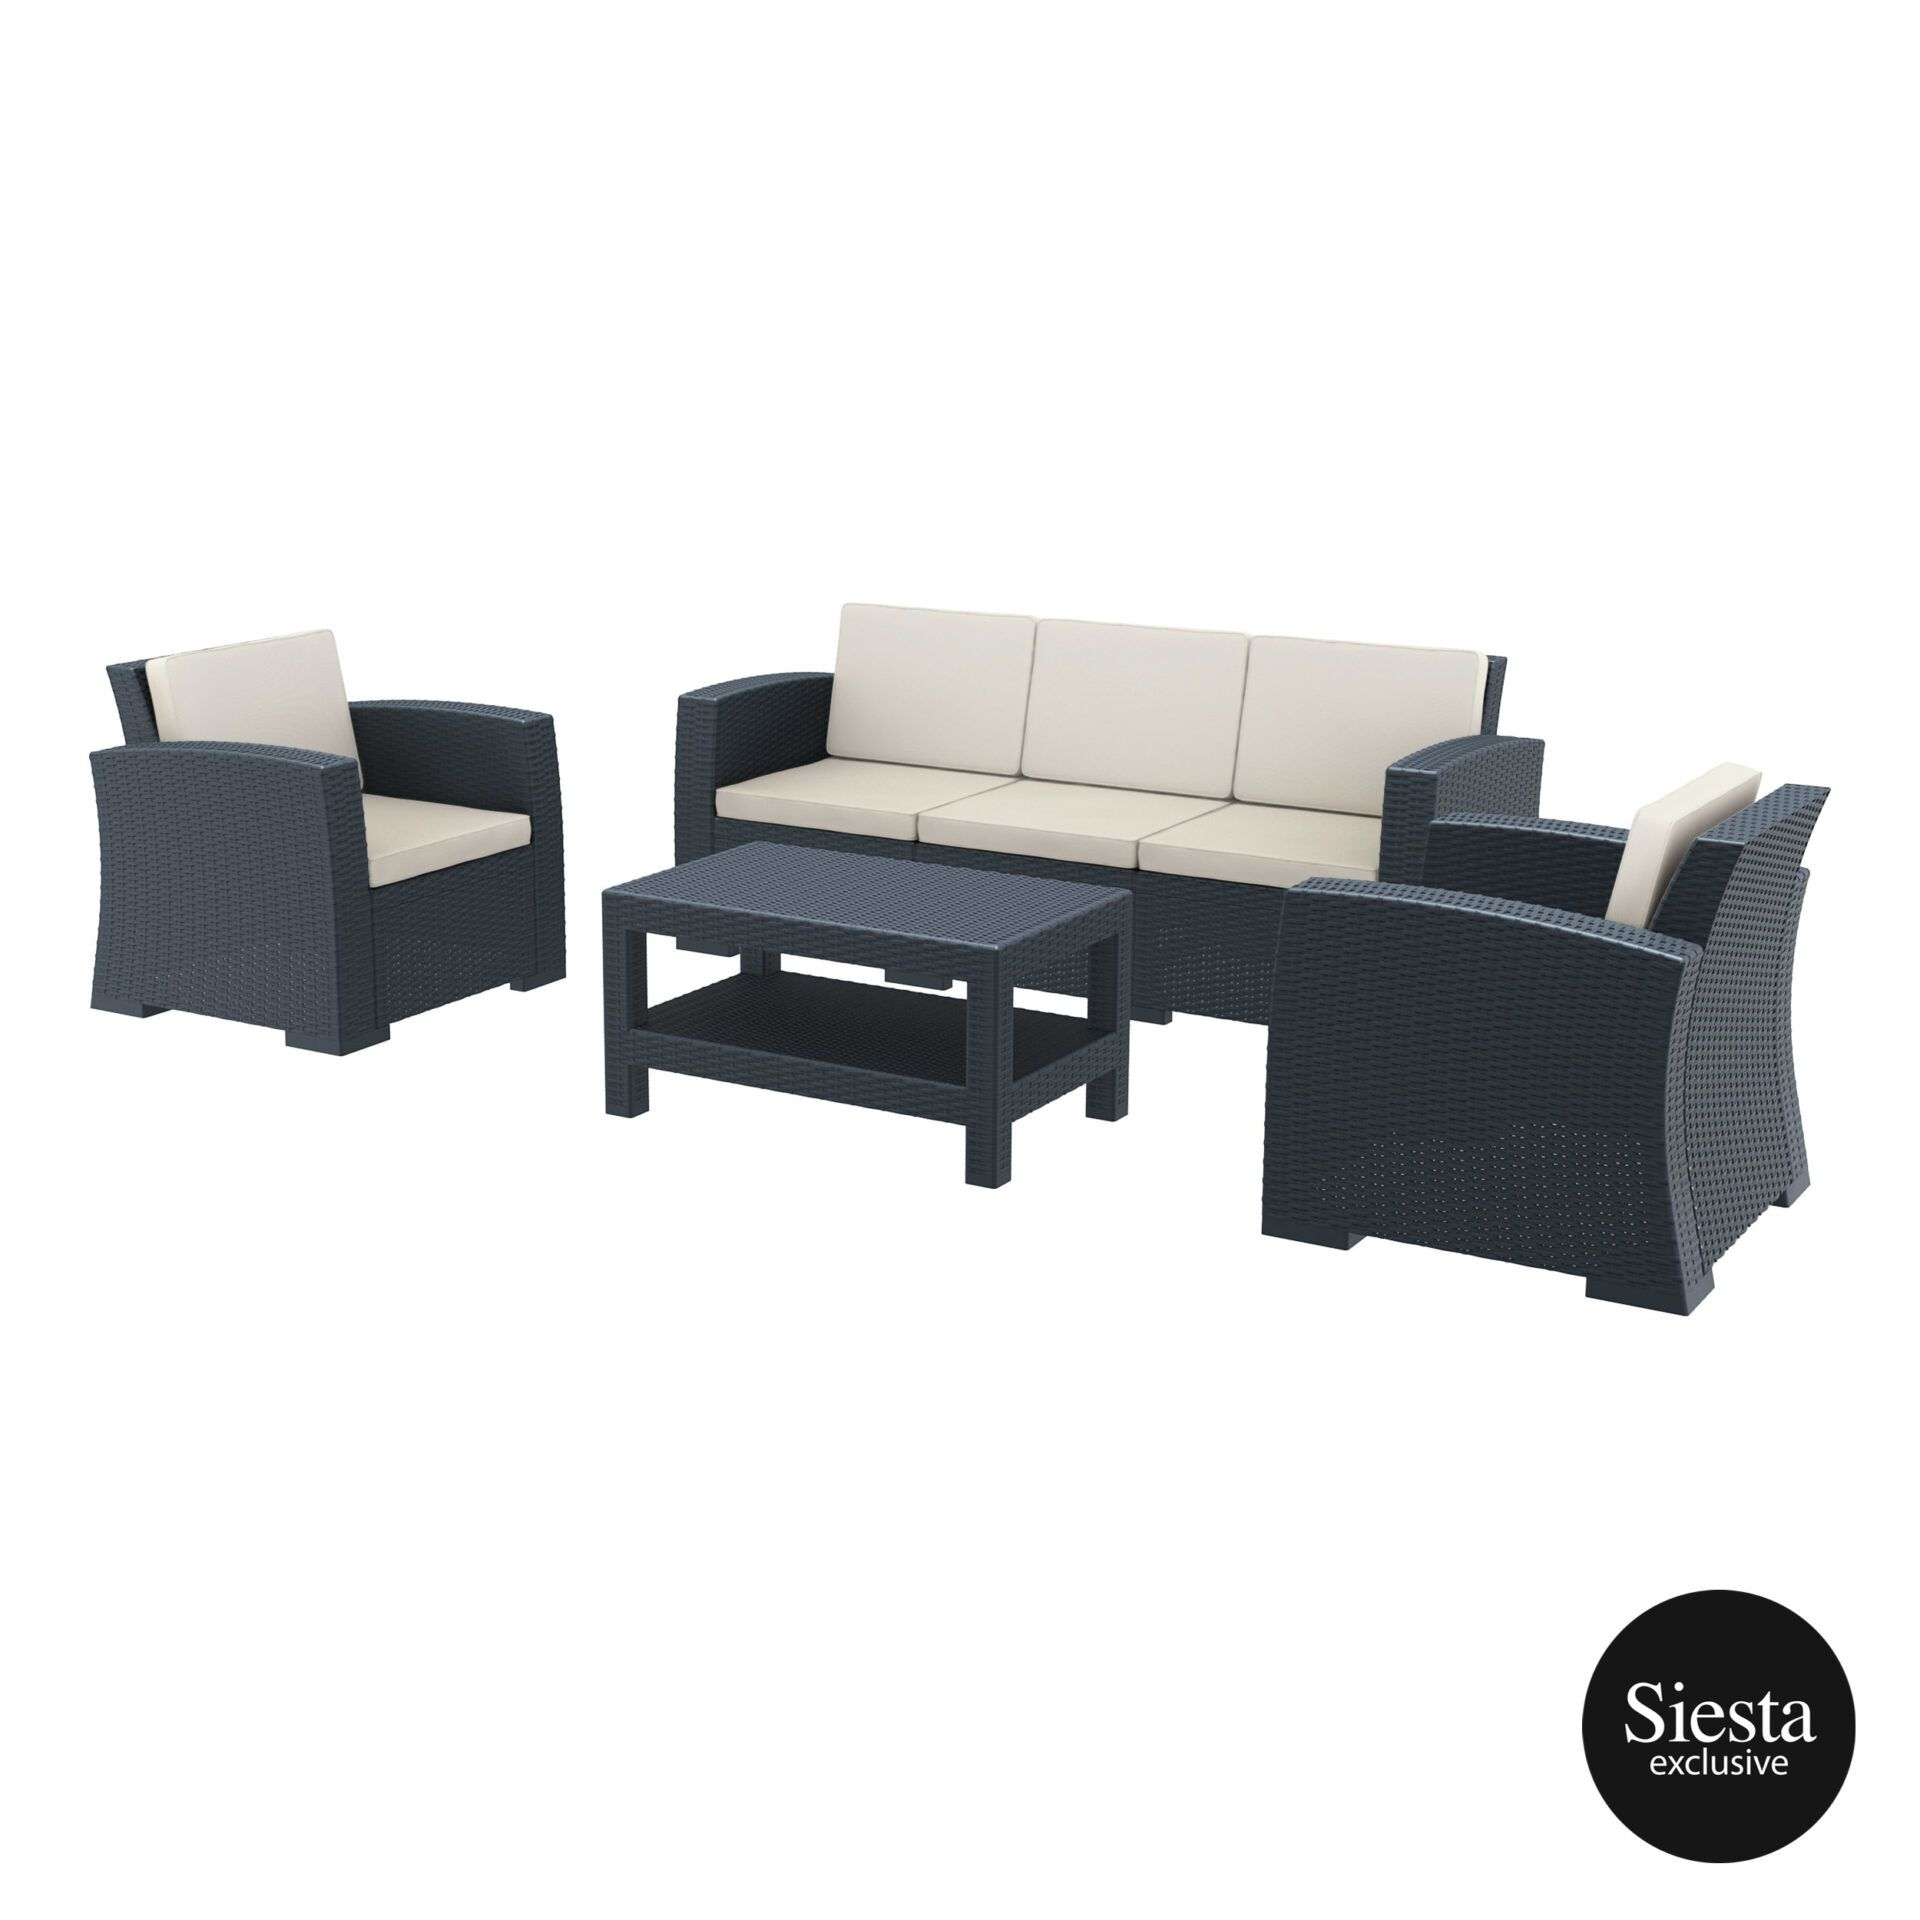 Resin Rattan Monaco Lounge Set Xl darkgrey front side